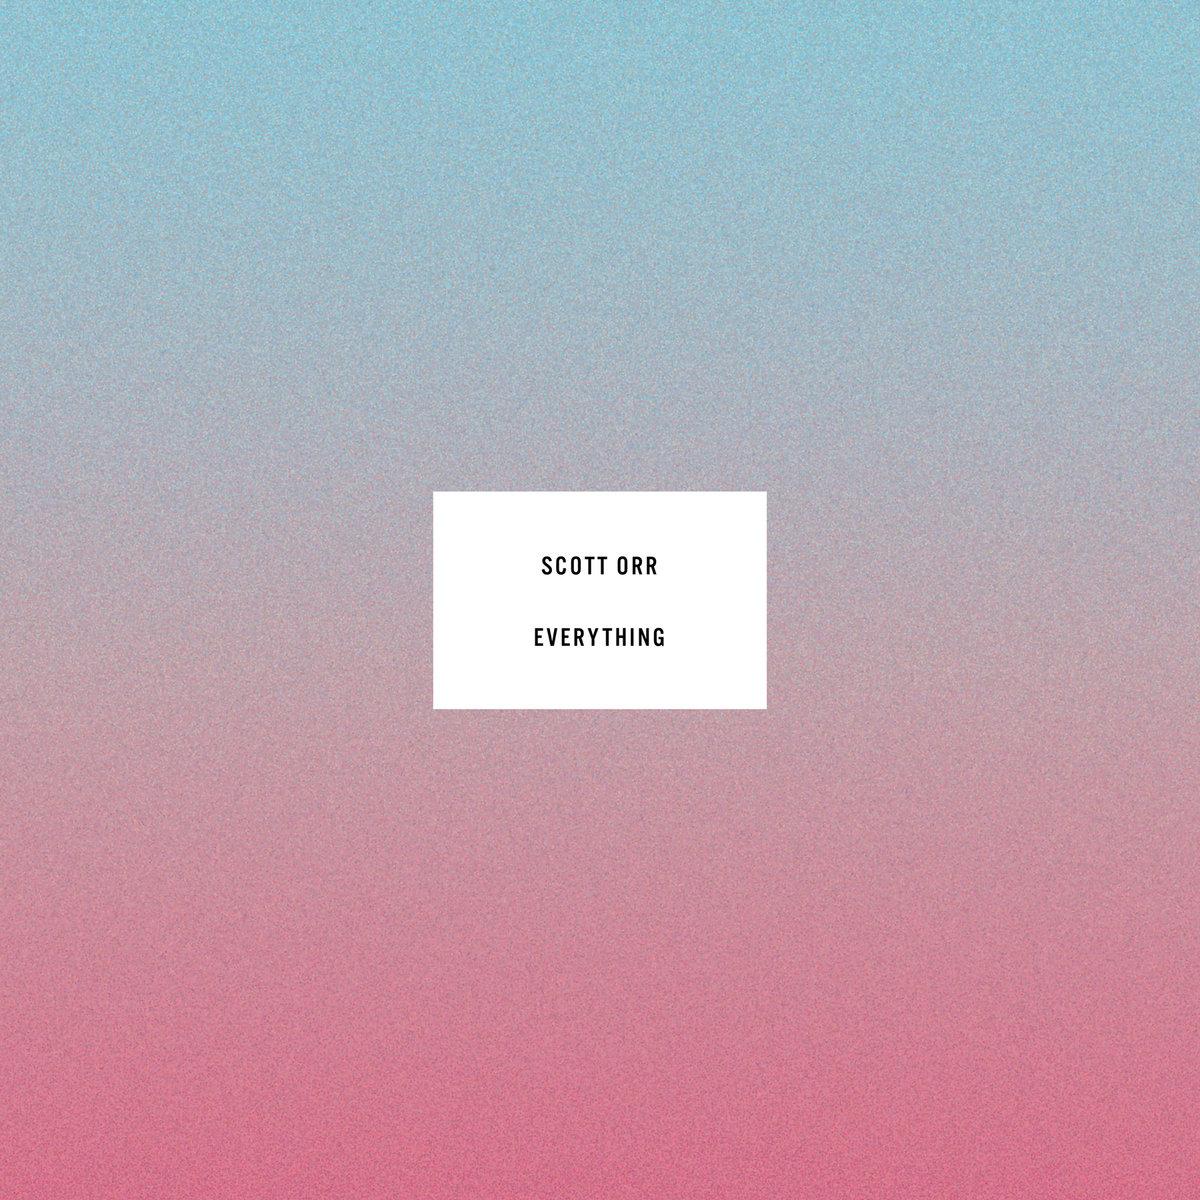 Scott Orr - Everything